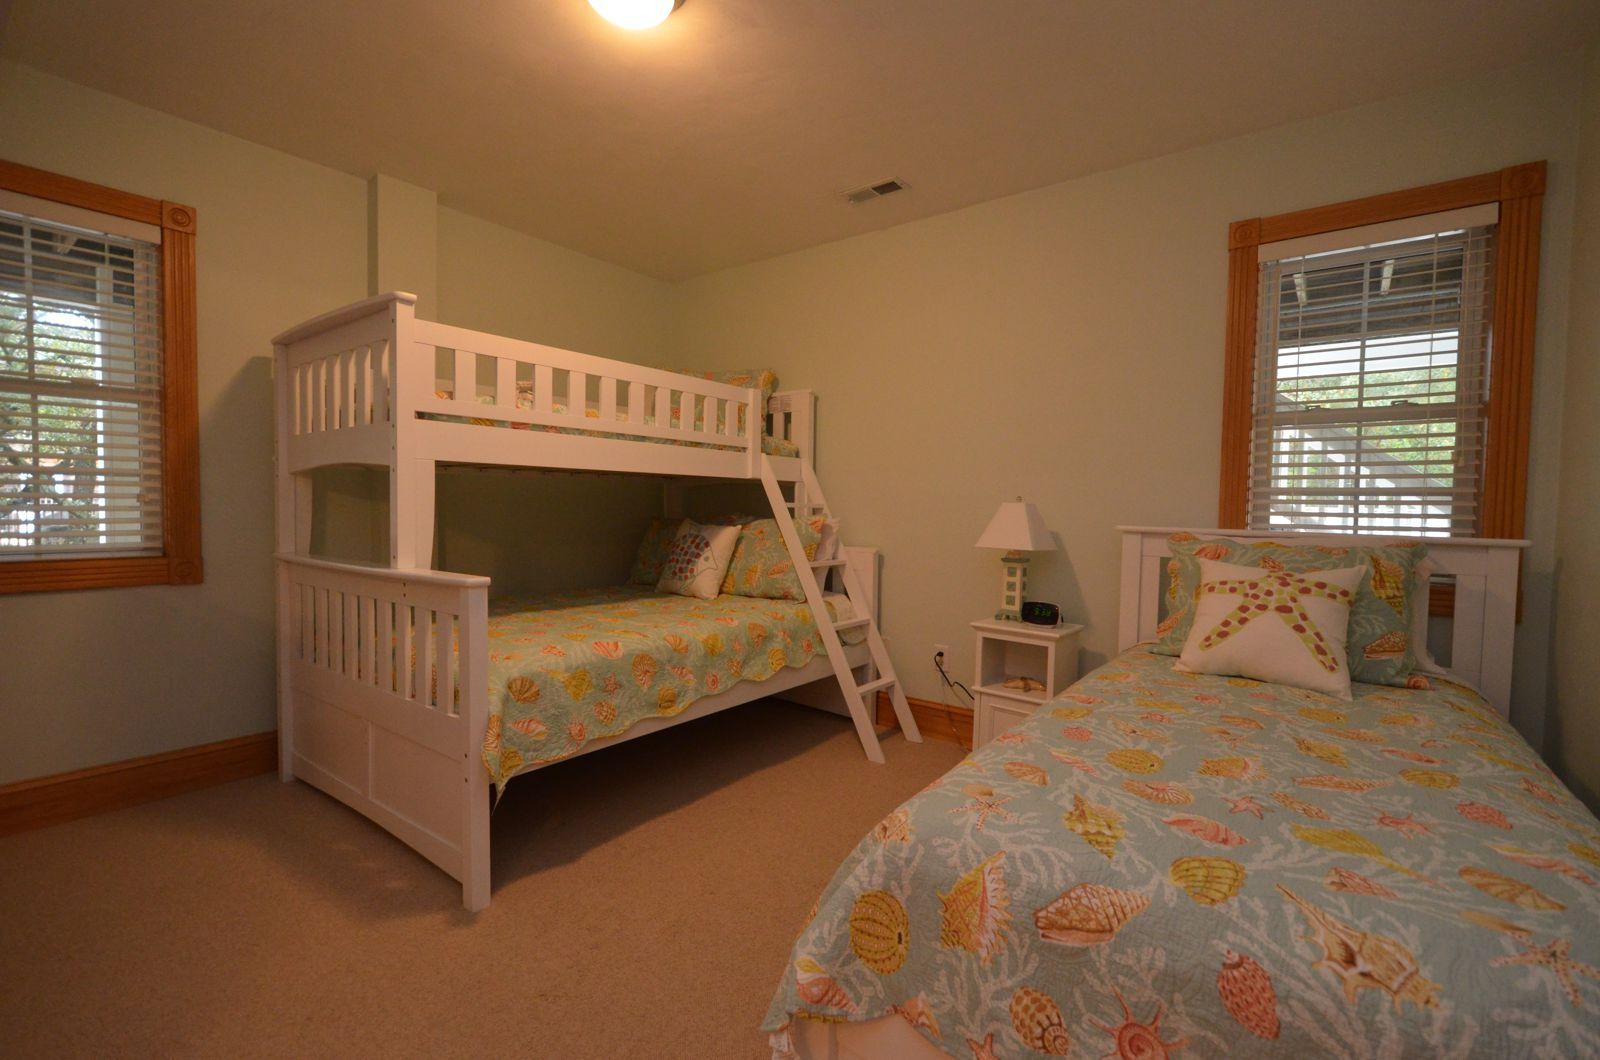 Sunshine - Bunk Bedroom